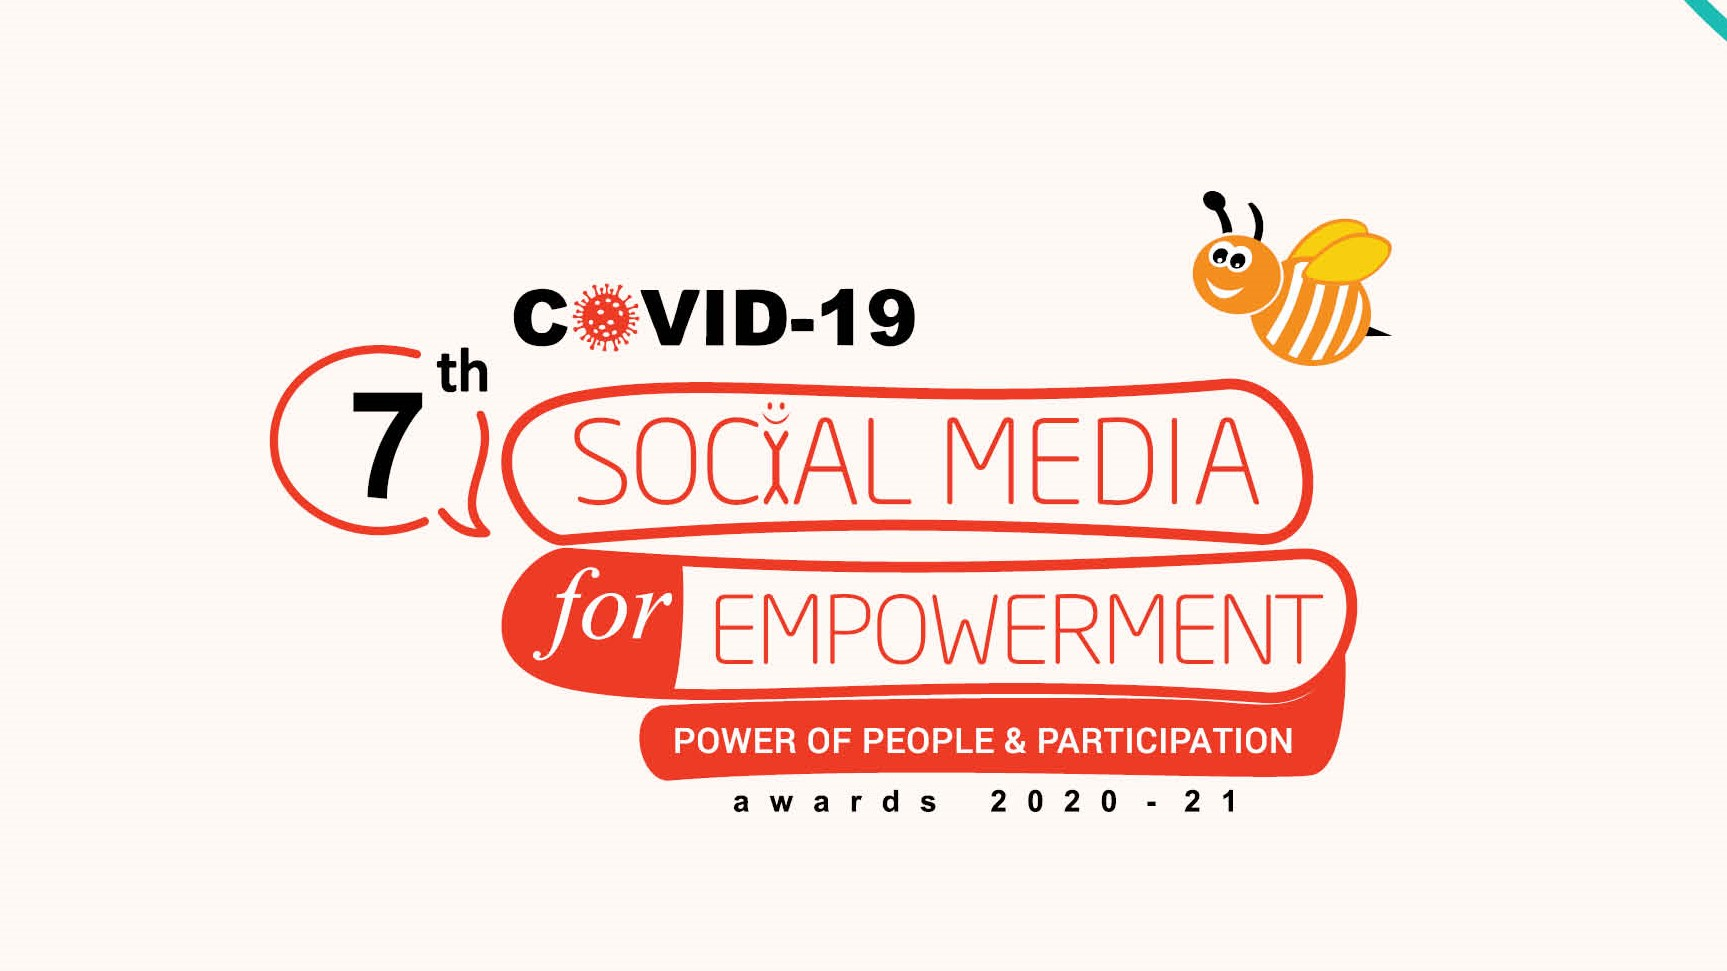 7th Social Media for Empowerment Award 2020-21